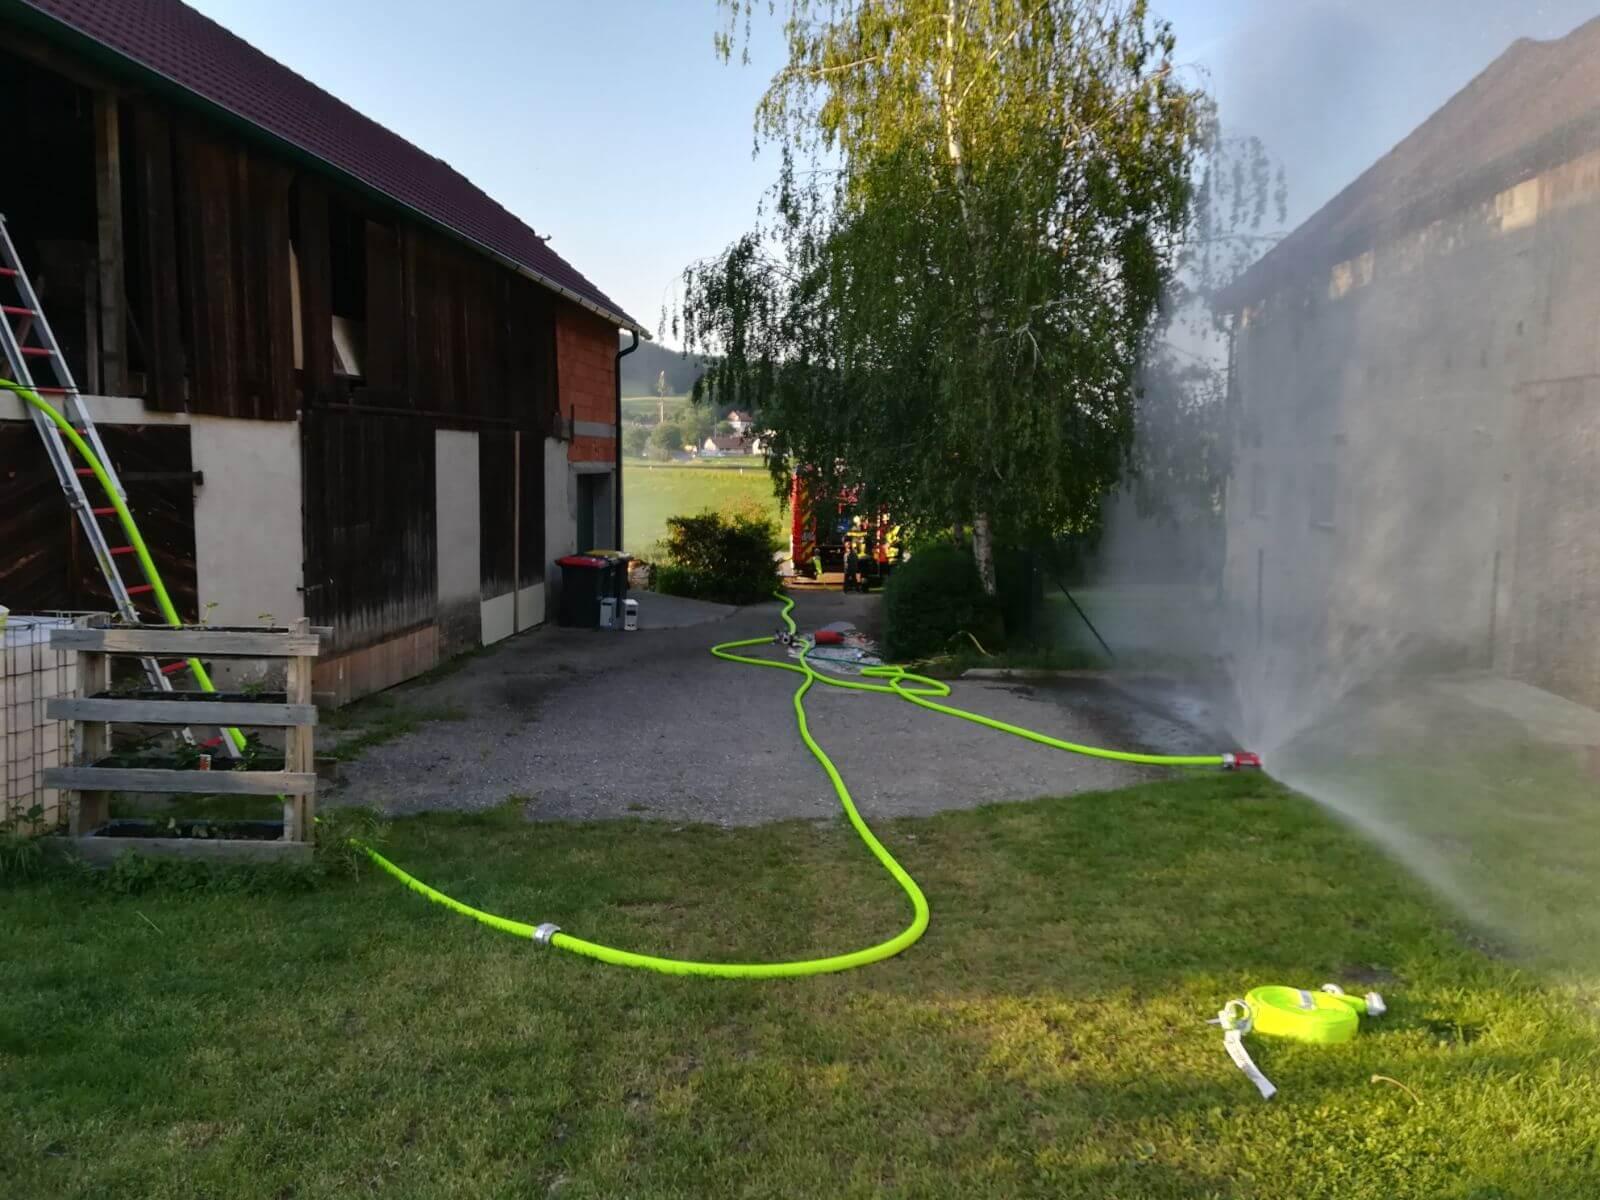 uebung-ffmannersdorf-1